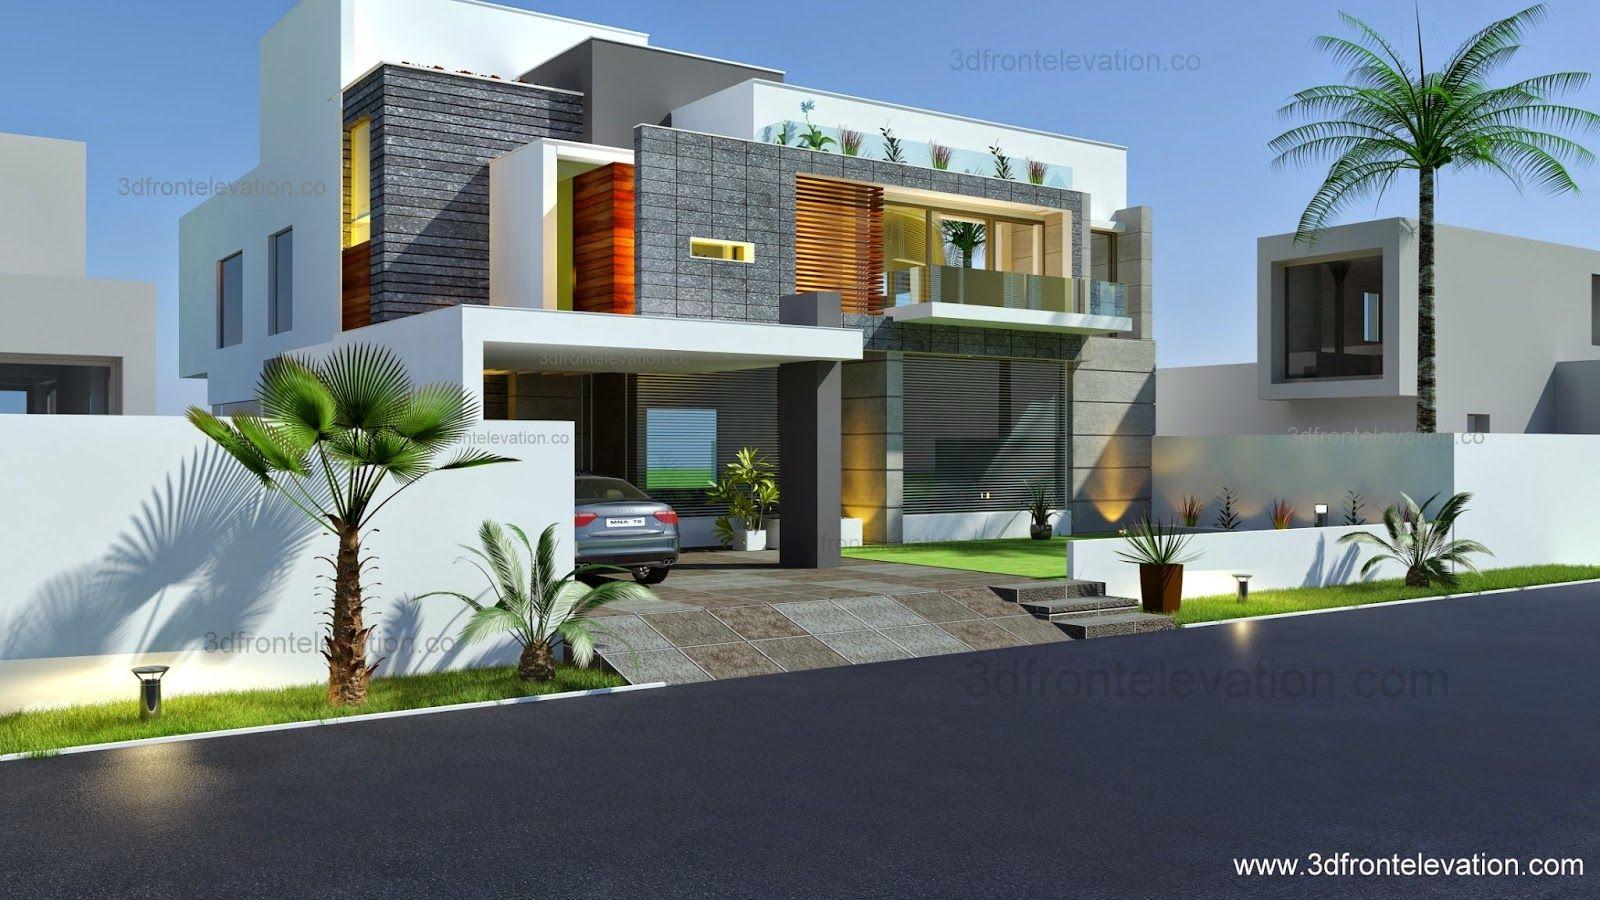 Sensational 3D Front Elevation Com Beautiful Modern Contemporary House Largest Home Design Picture Inspirations Pitcheantrous